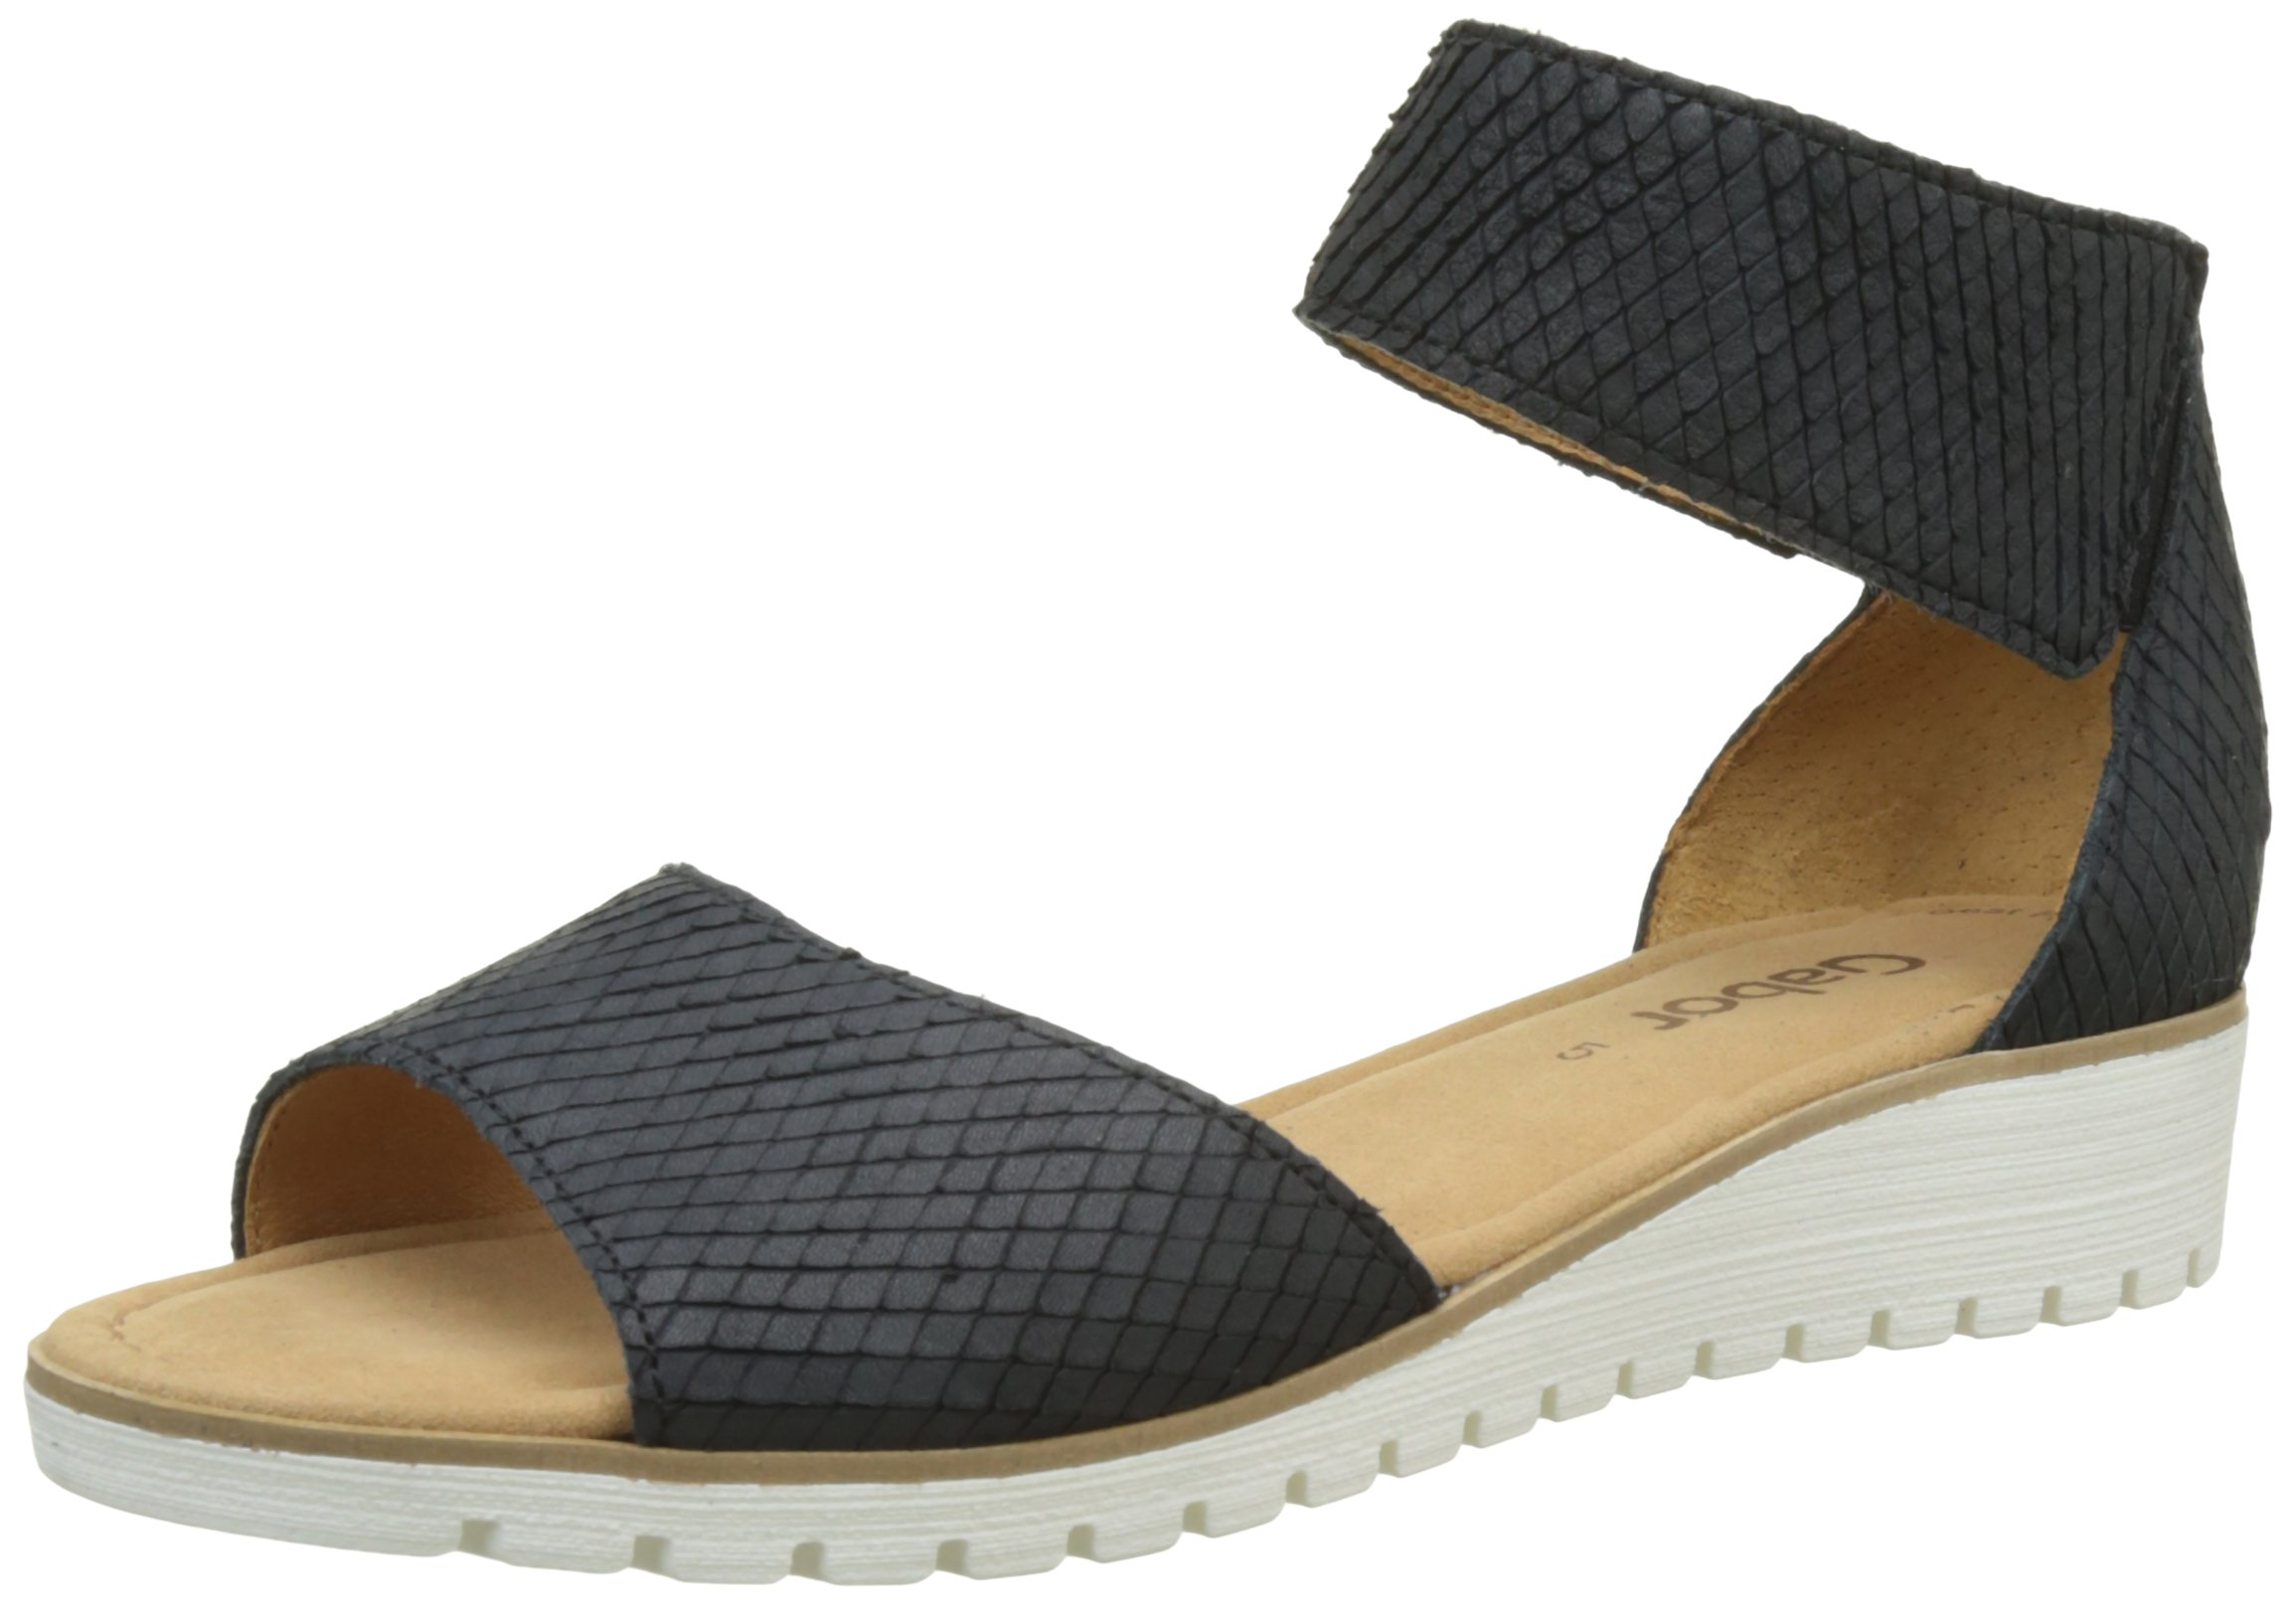 Femme, Sandales, Ethnic Wedge Sandals with Strass, Noir (Black), 37Tantra